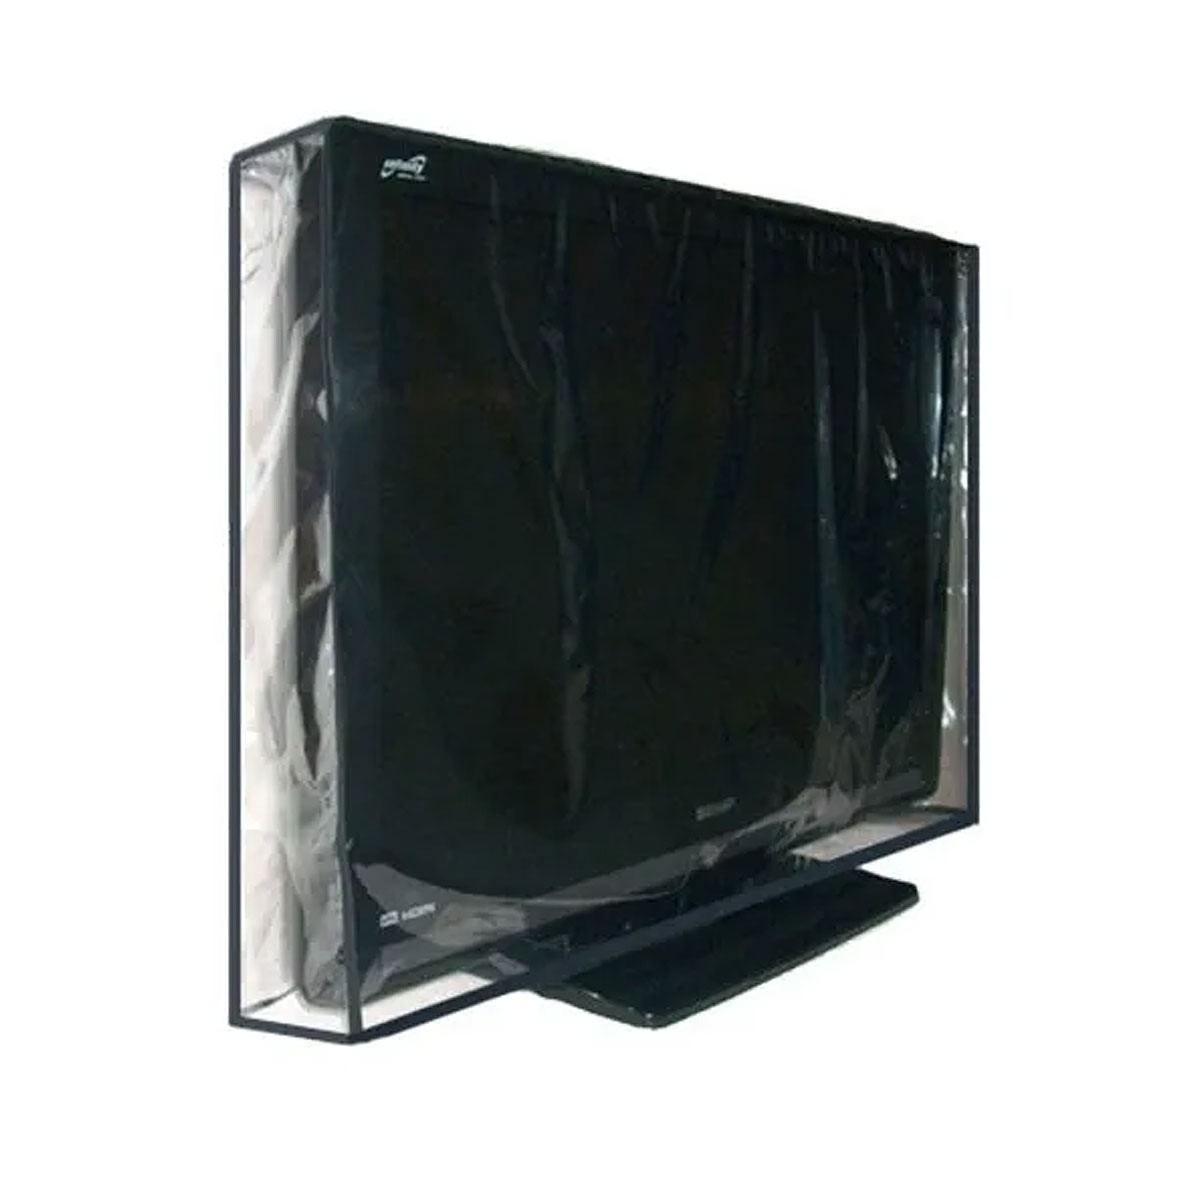 Capa Em Pvc Cristal Para Tv Lcd 32 - Aberta Atrás